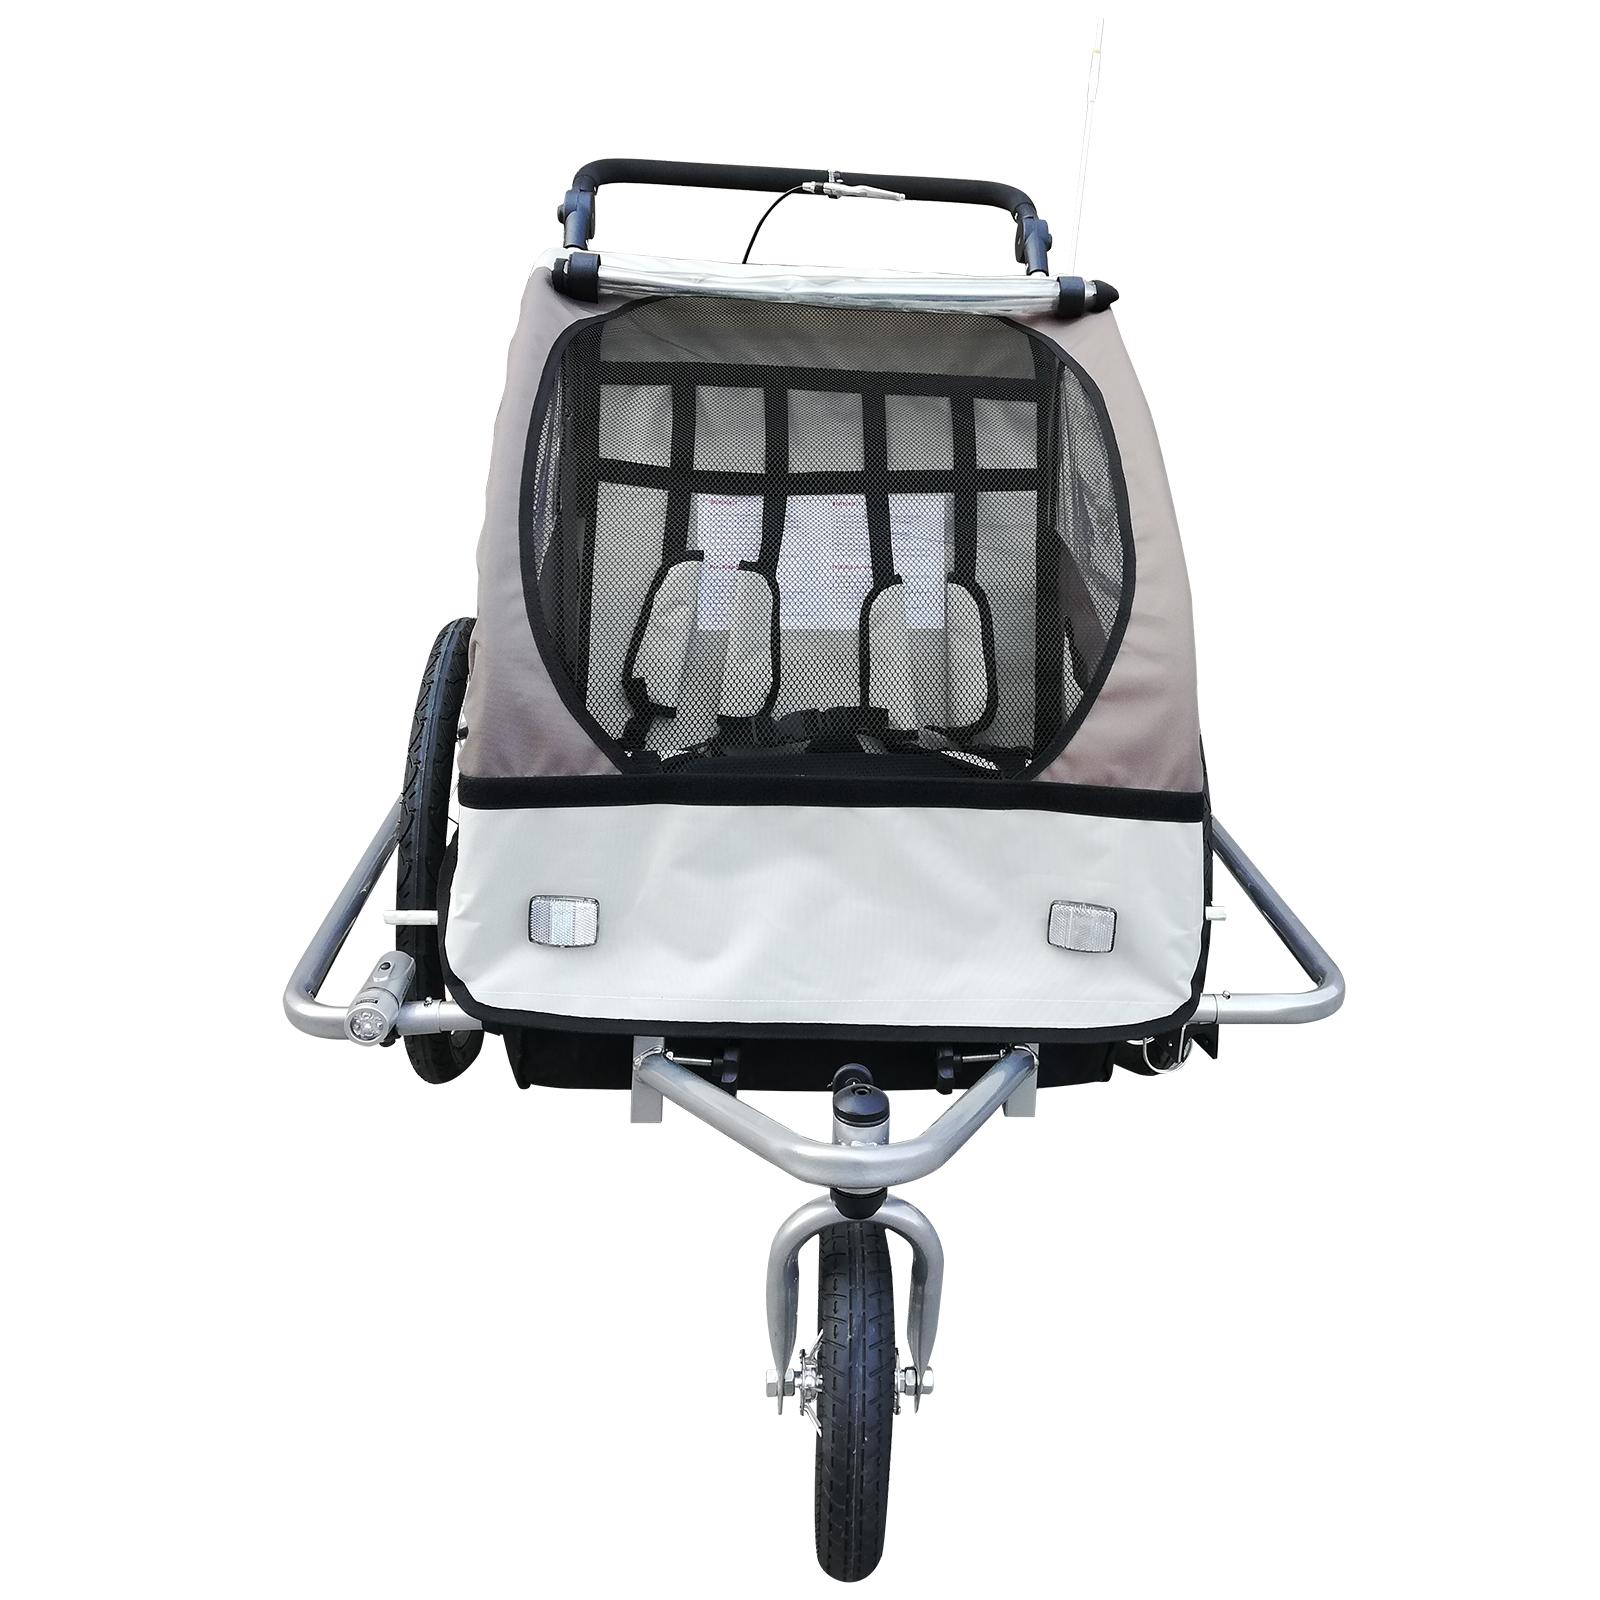 Remolque-Infantil-Bicicleta-2-PLAZAS-Kit-Footing-Rueda-360-Amortiguadores-Barra miniatura 23